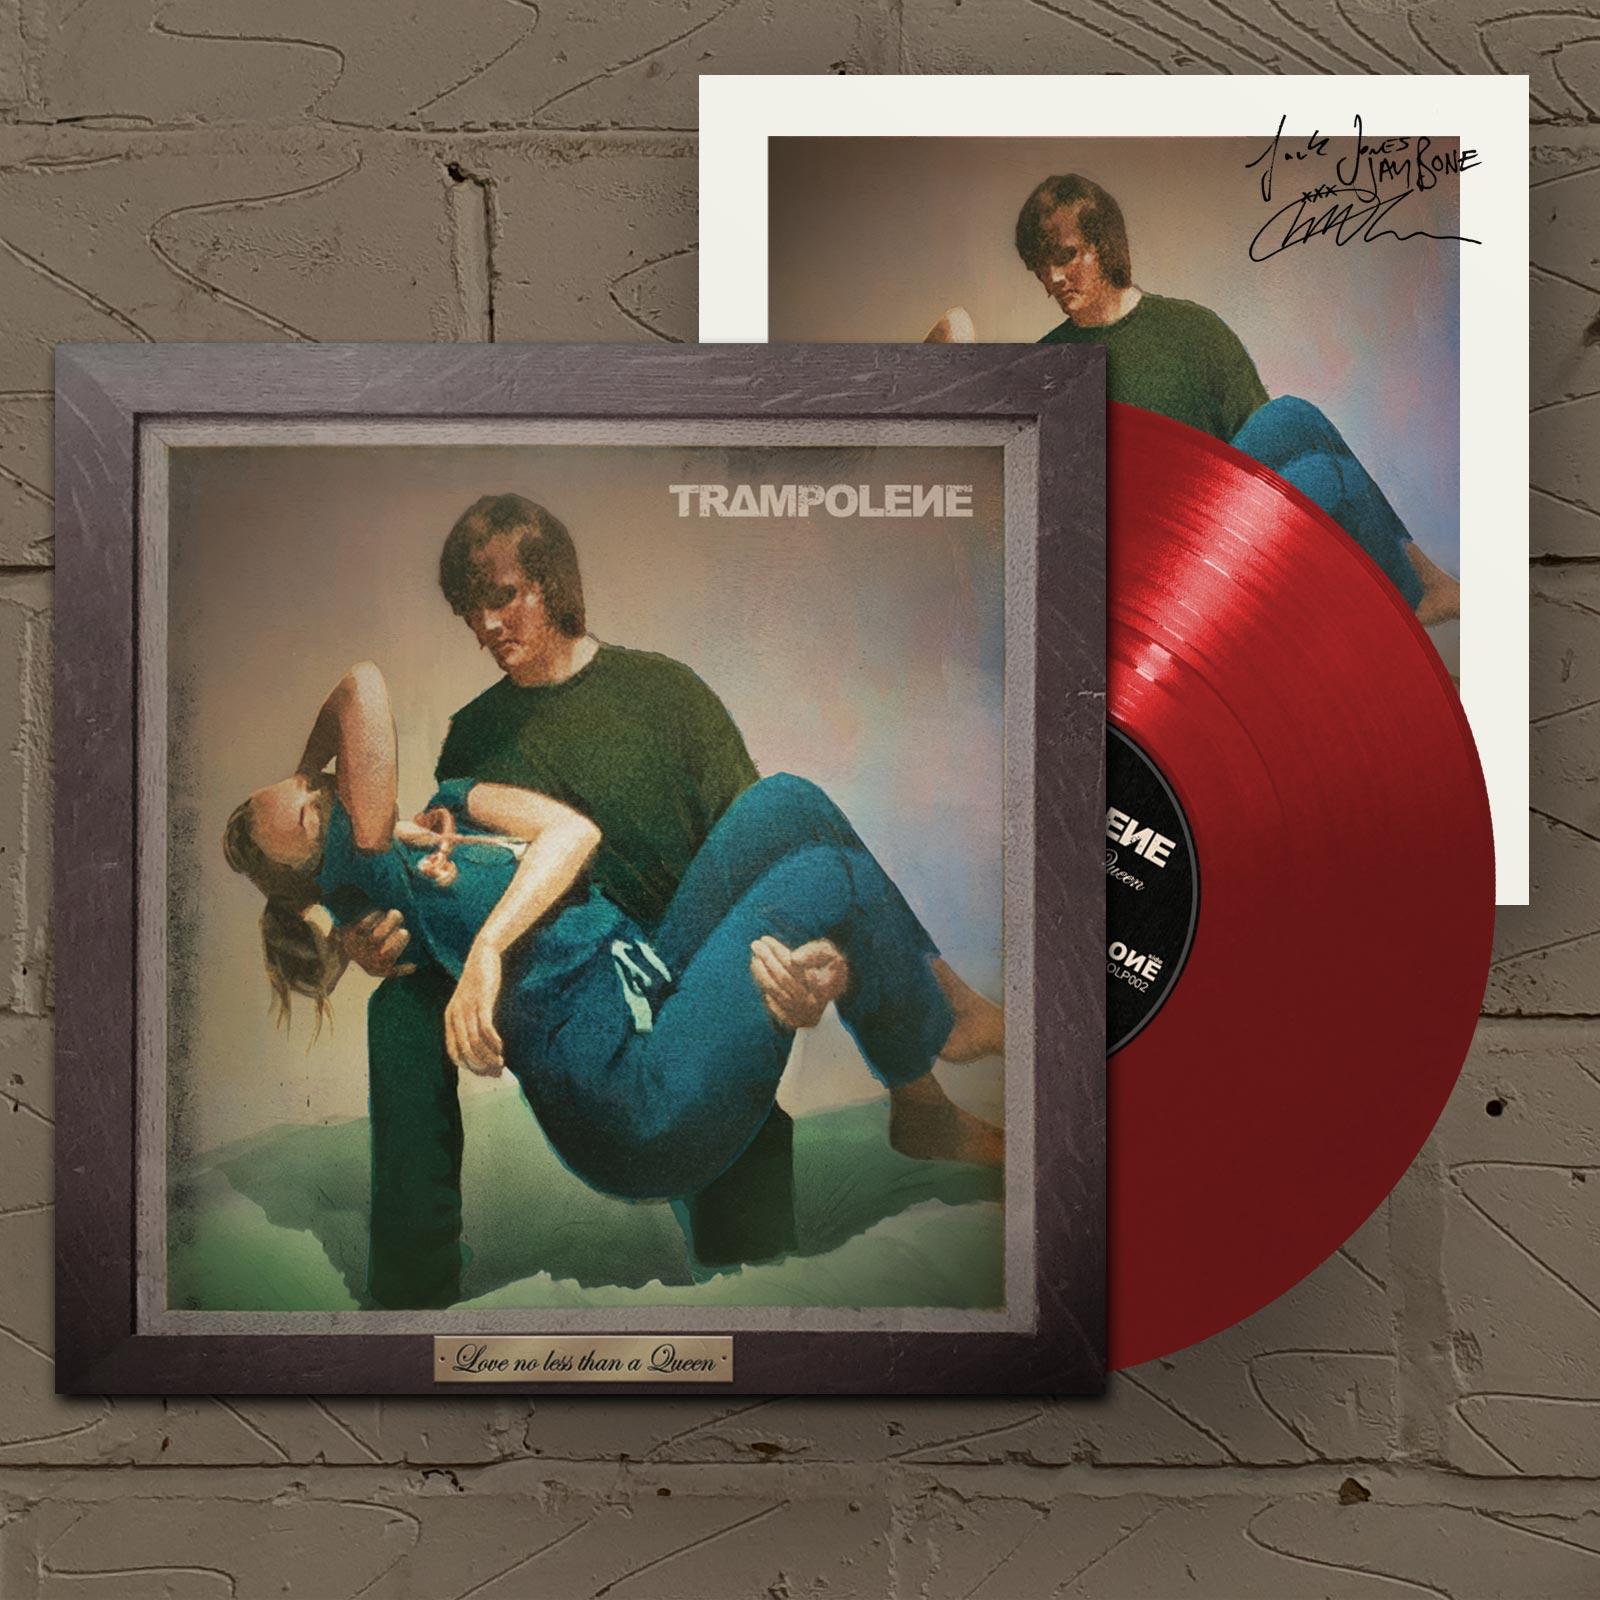 Love No Less Than A Queen Red LP